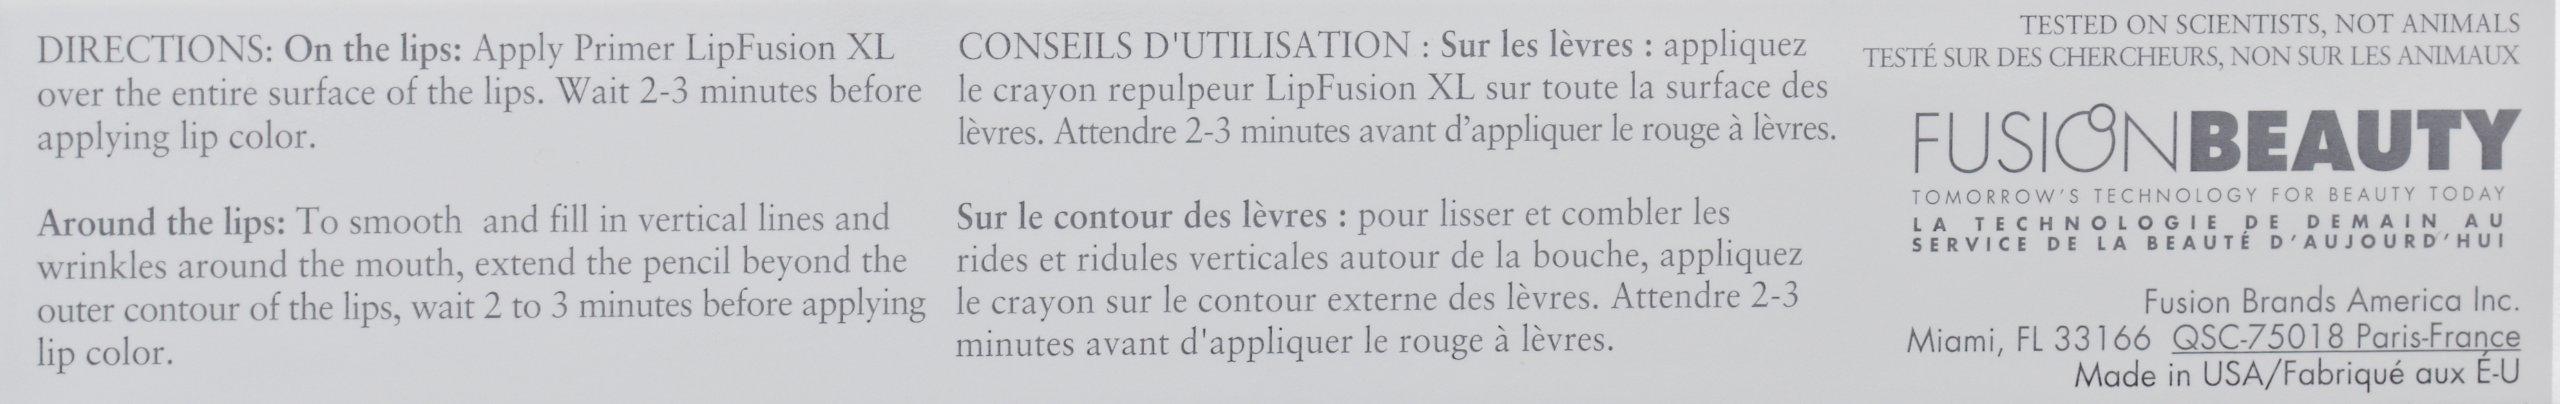 Fusion Beauty Lipfusion Xl Primer Pencil, 0.18 Ounce